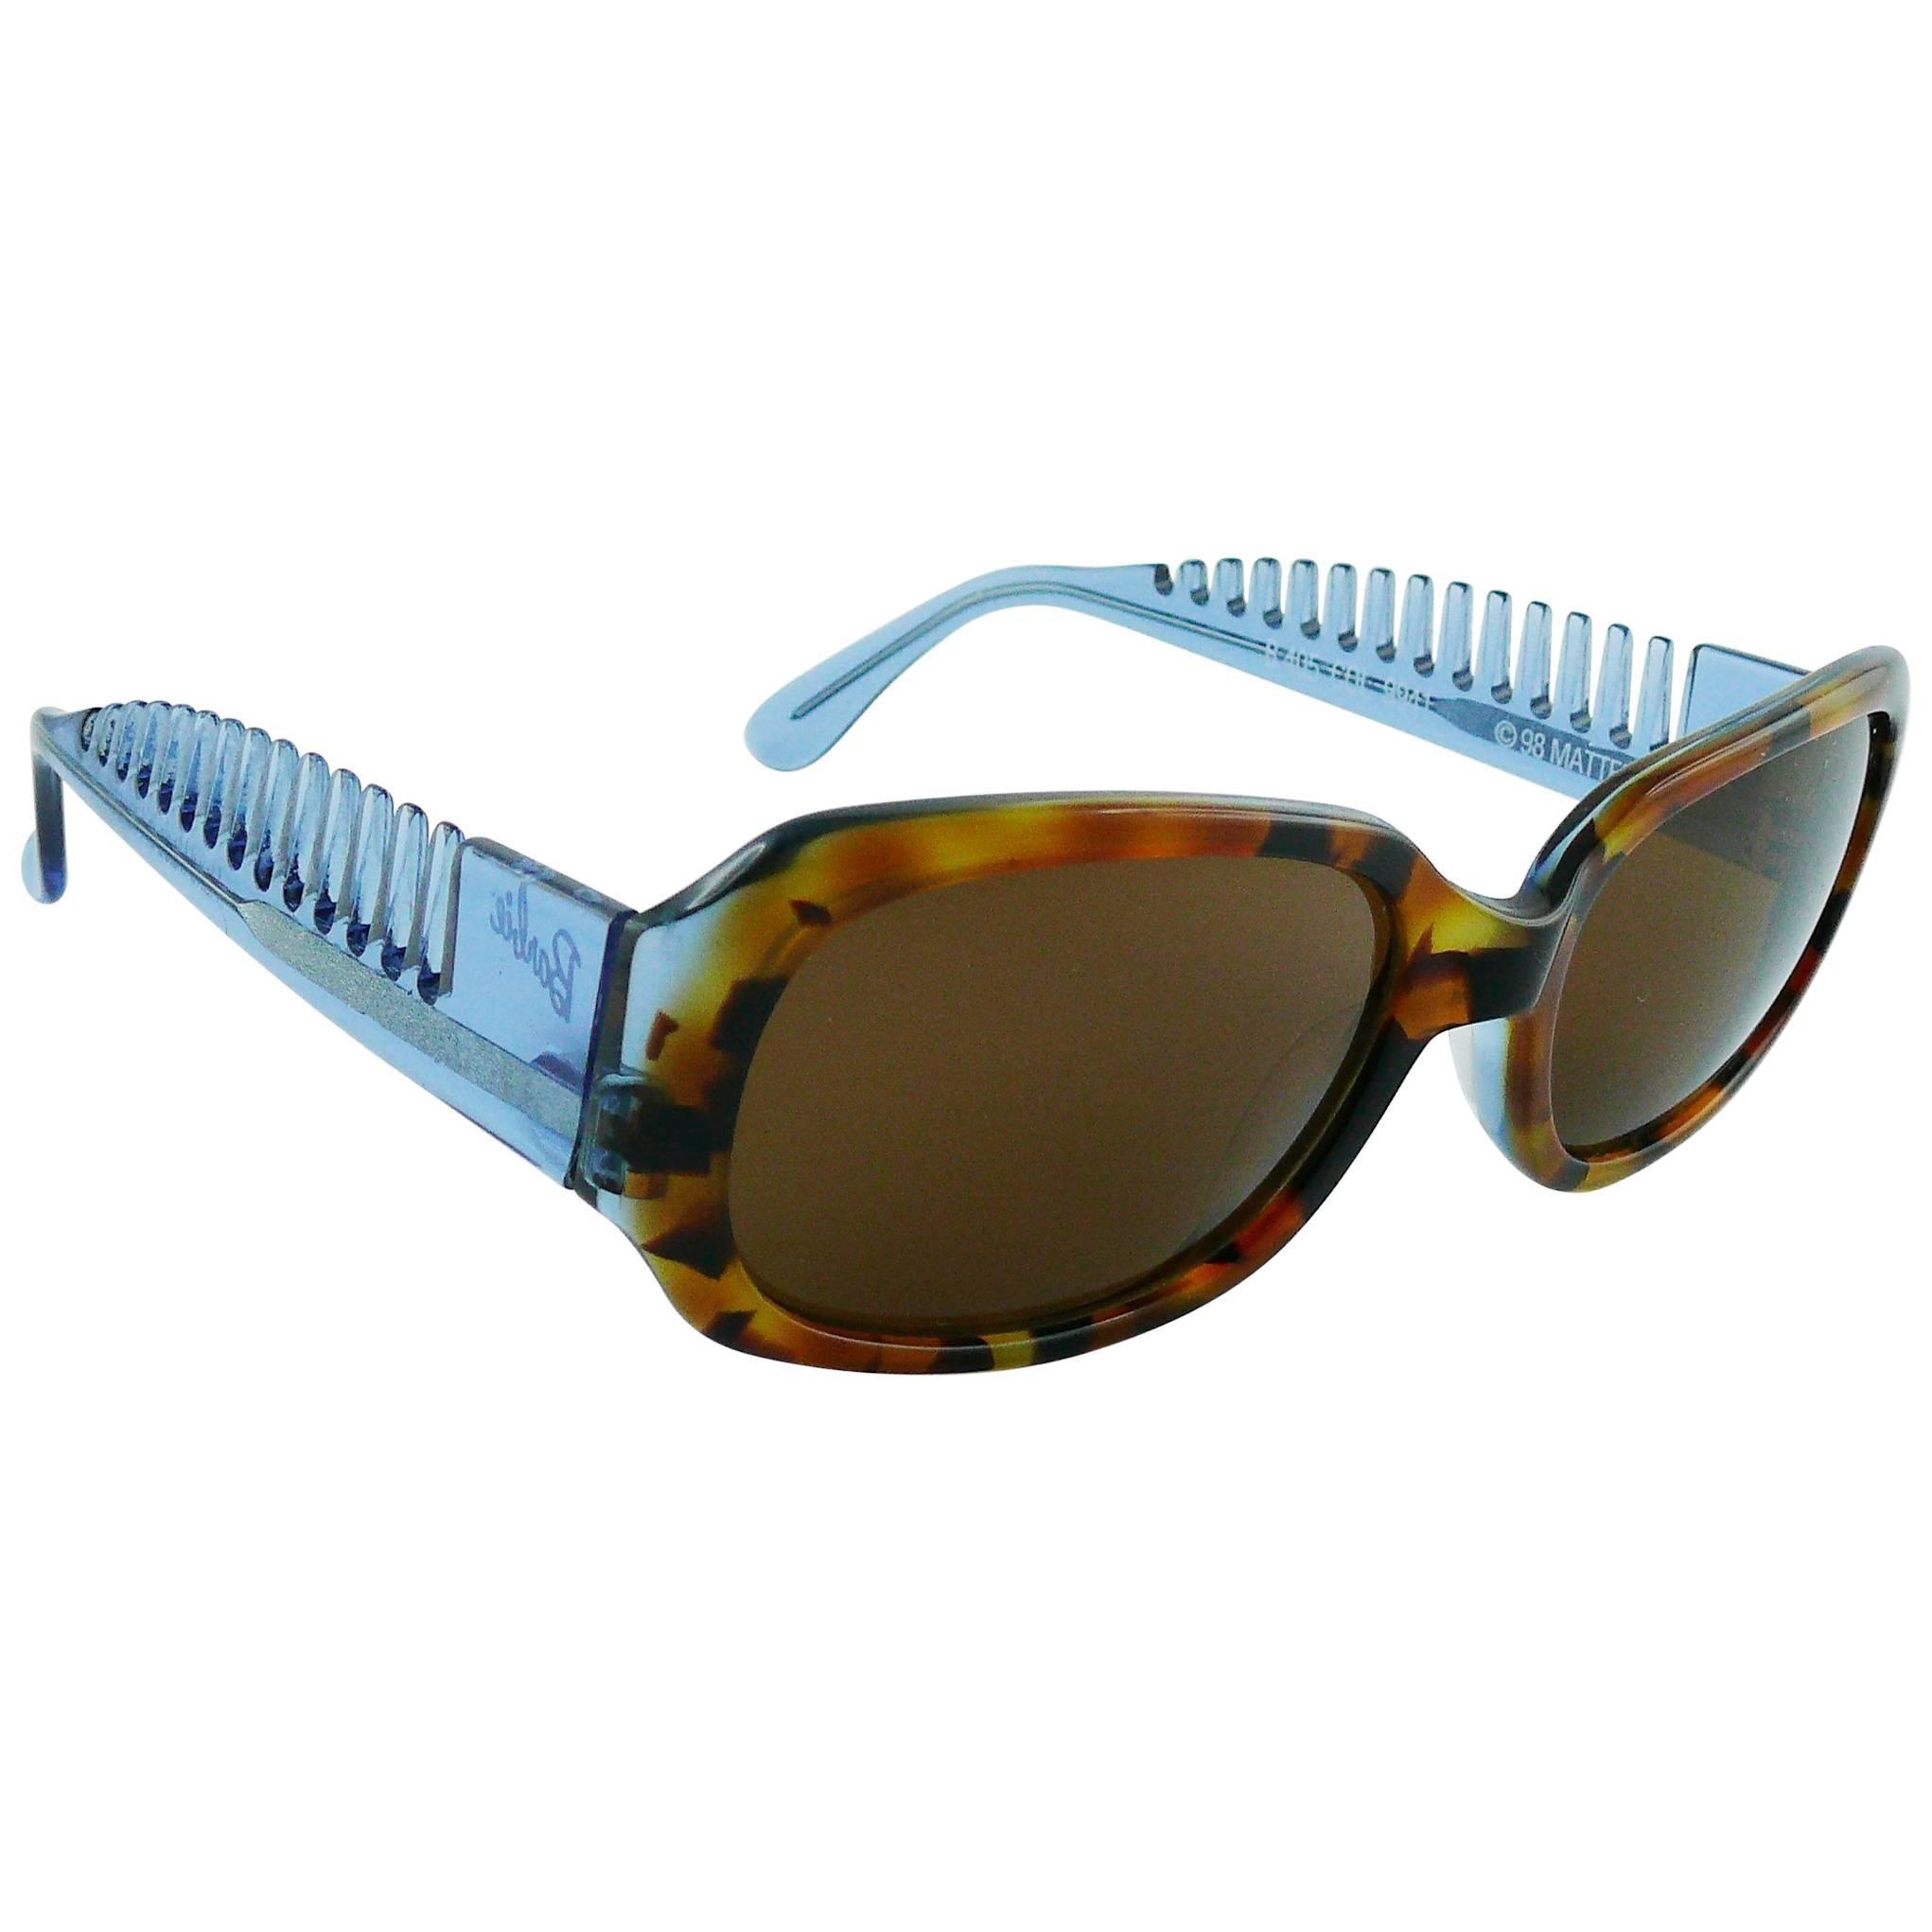 Alain Mikli x Barbie Vintage 1990s Sunglasses with Comb Temples